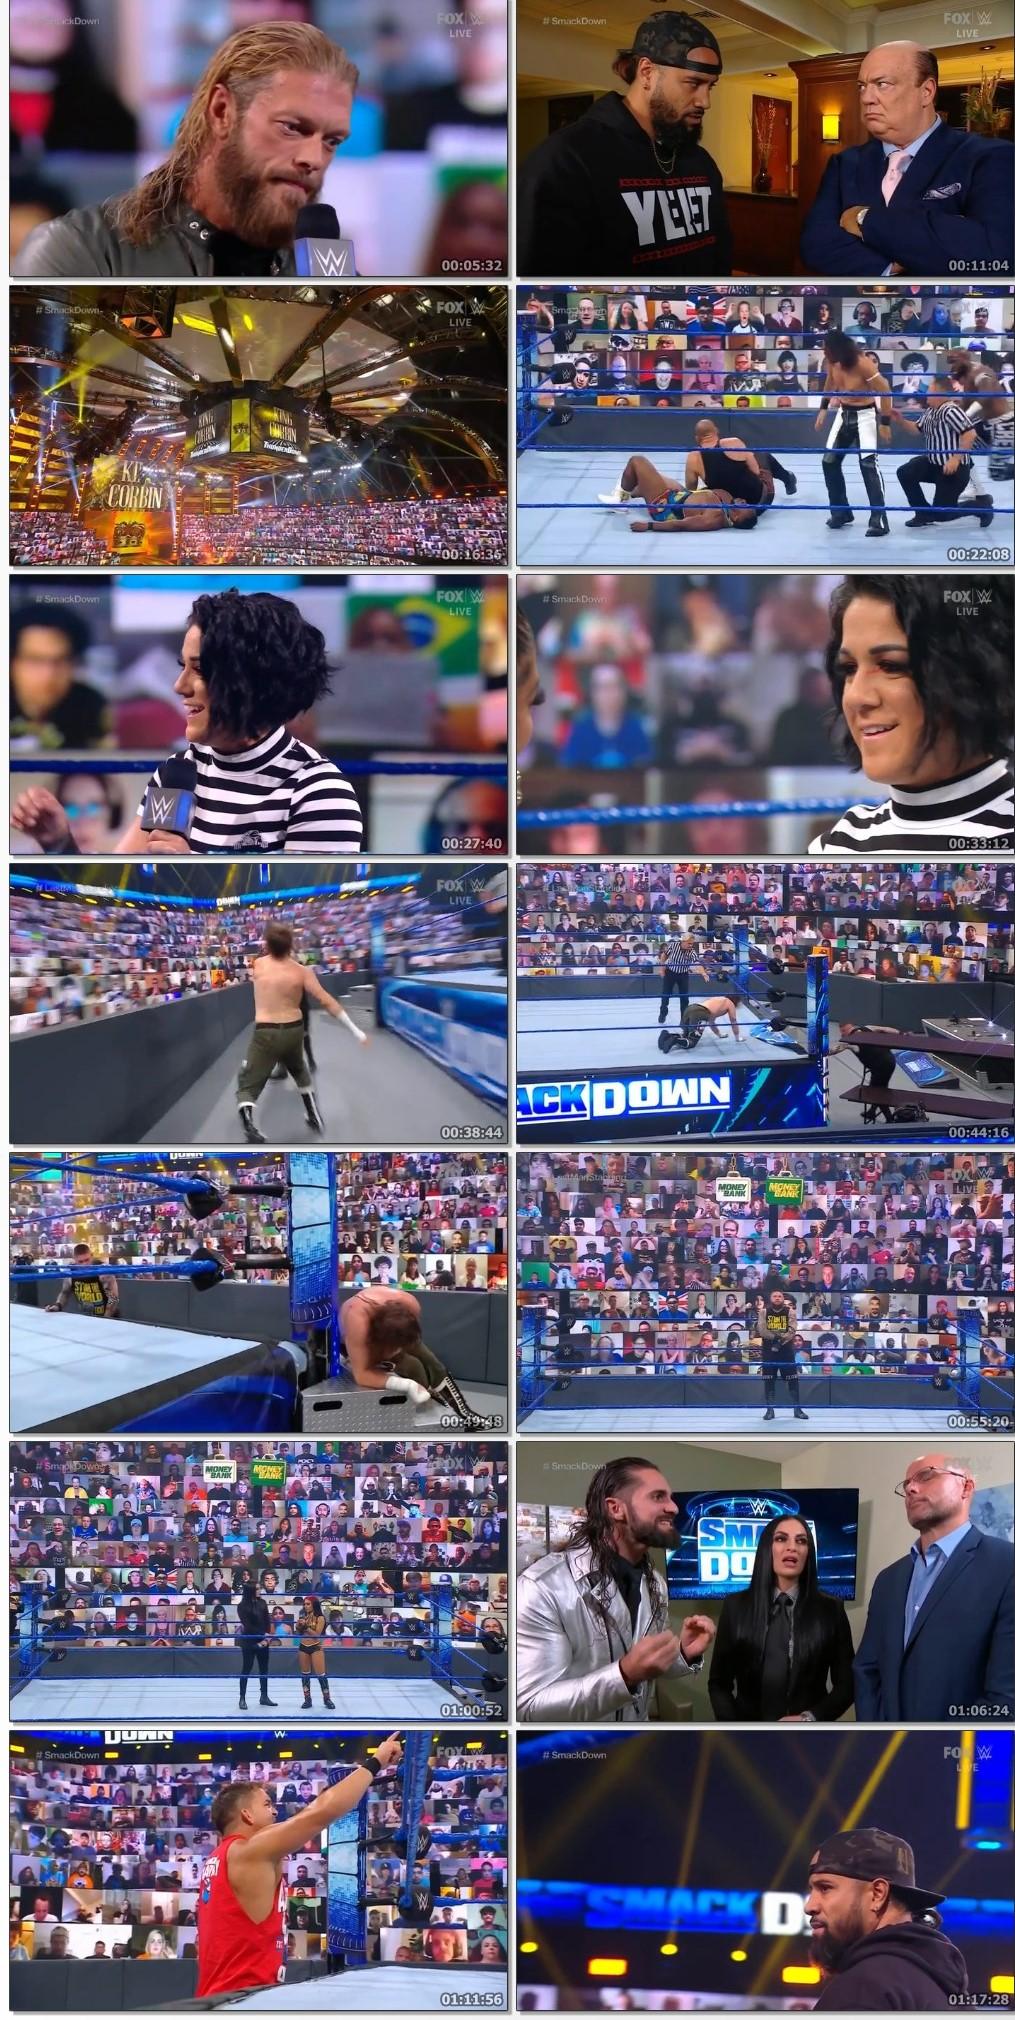 WWE-Friday-Night-Smack-Down-2-July-2021-English-720p-HDRip-960-MB-mkv-thumbsc0a1e780b8e051ac